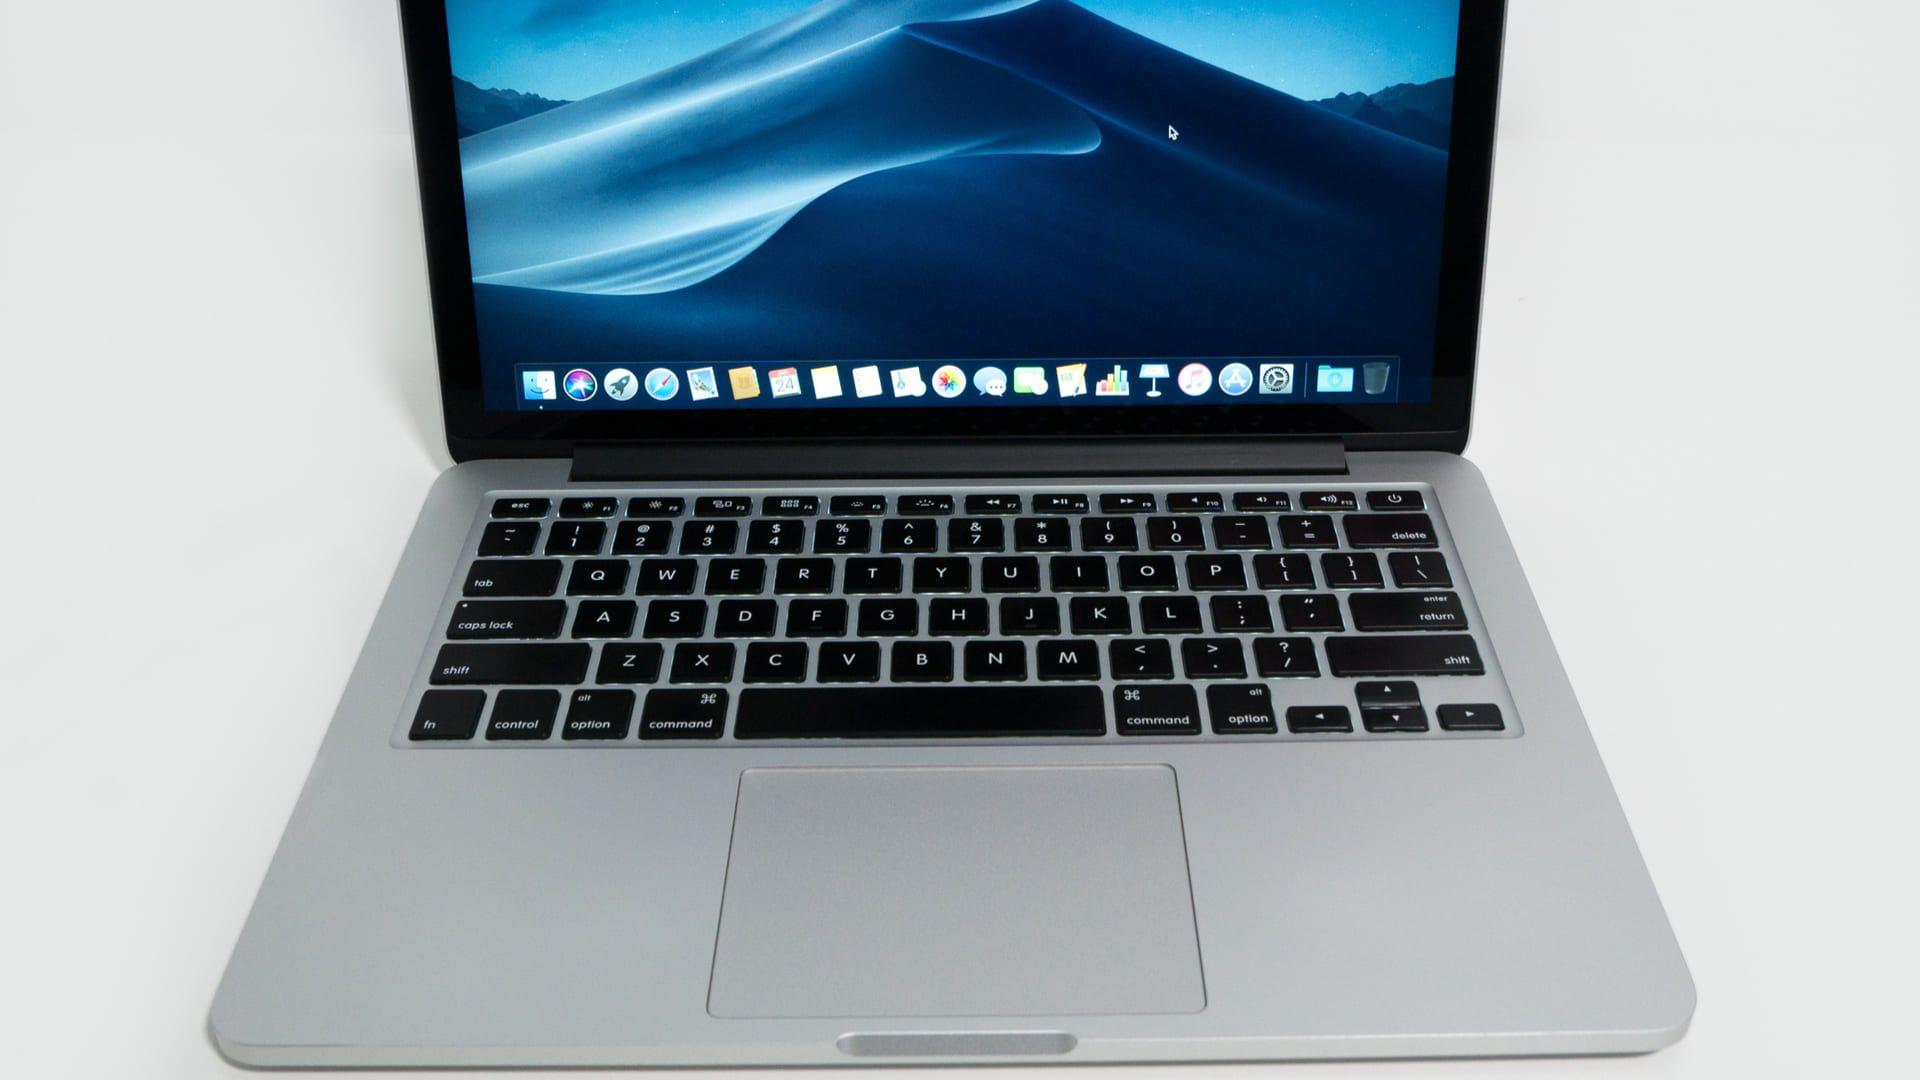 Teclado e touchpad do MacBook Pro 2019 (Foto: Shutterstock)